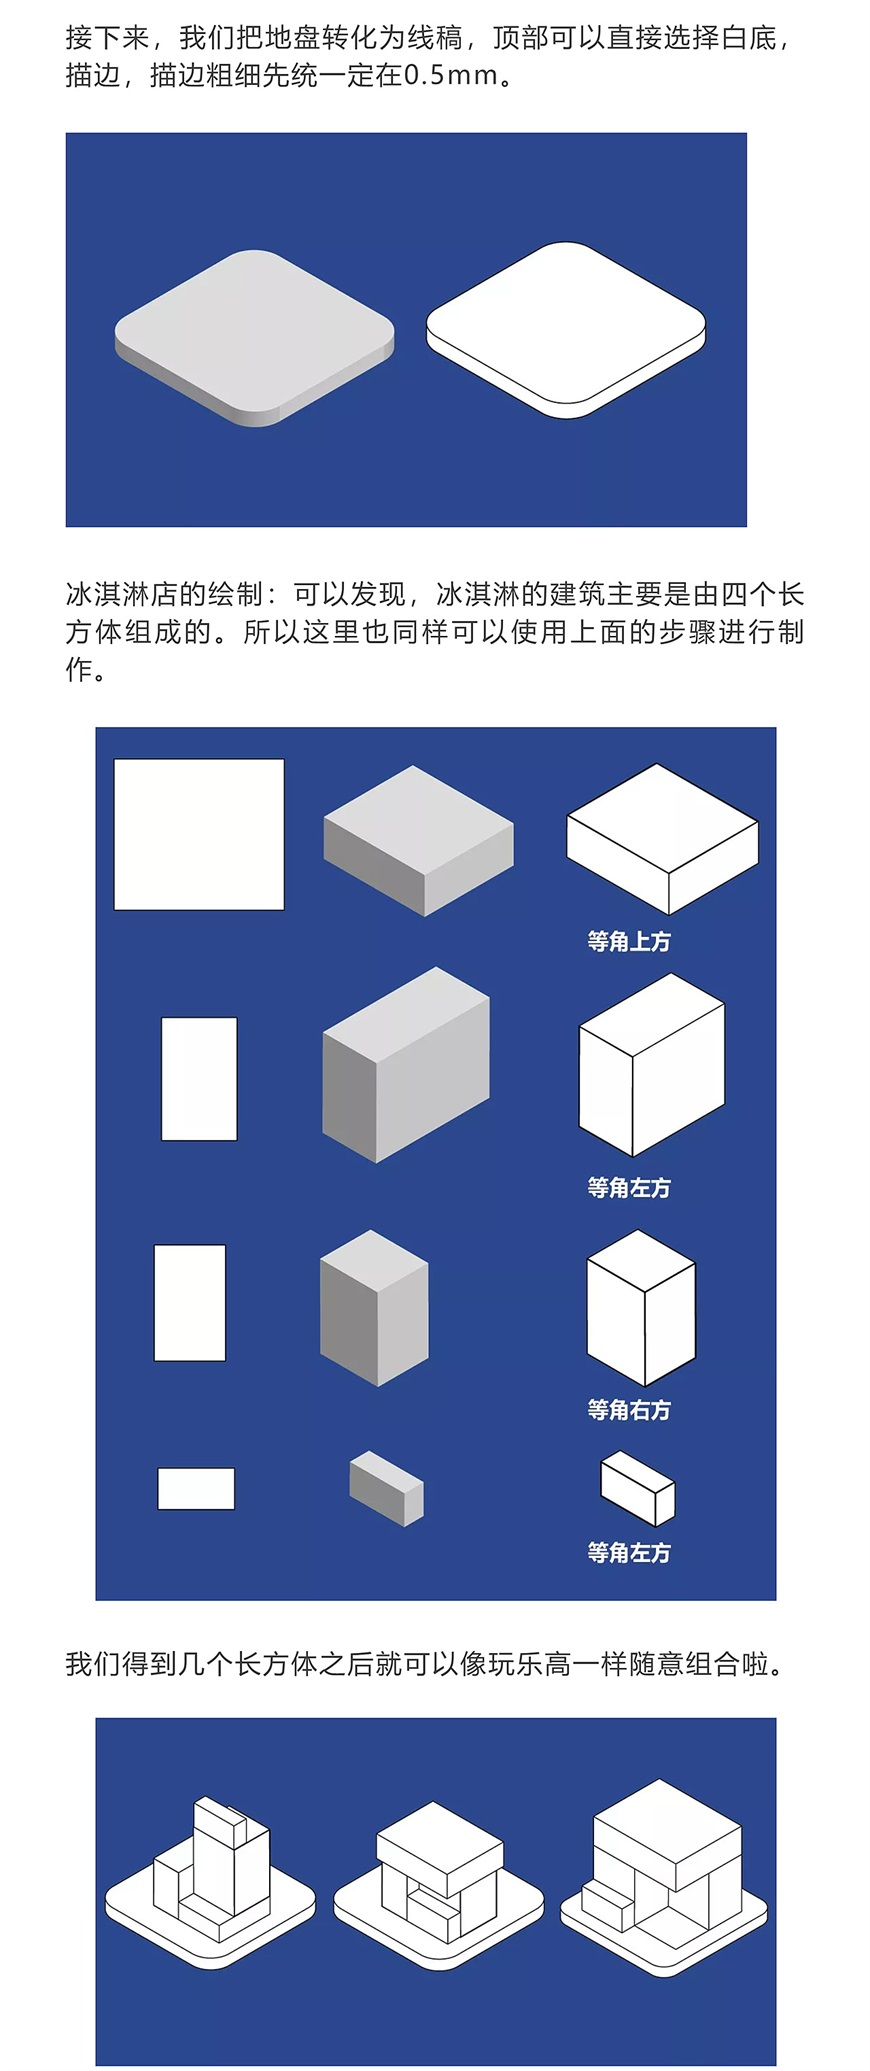 AI教程!带你解锁2.5D商业插画